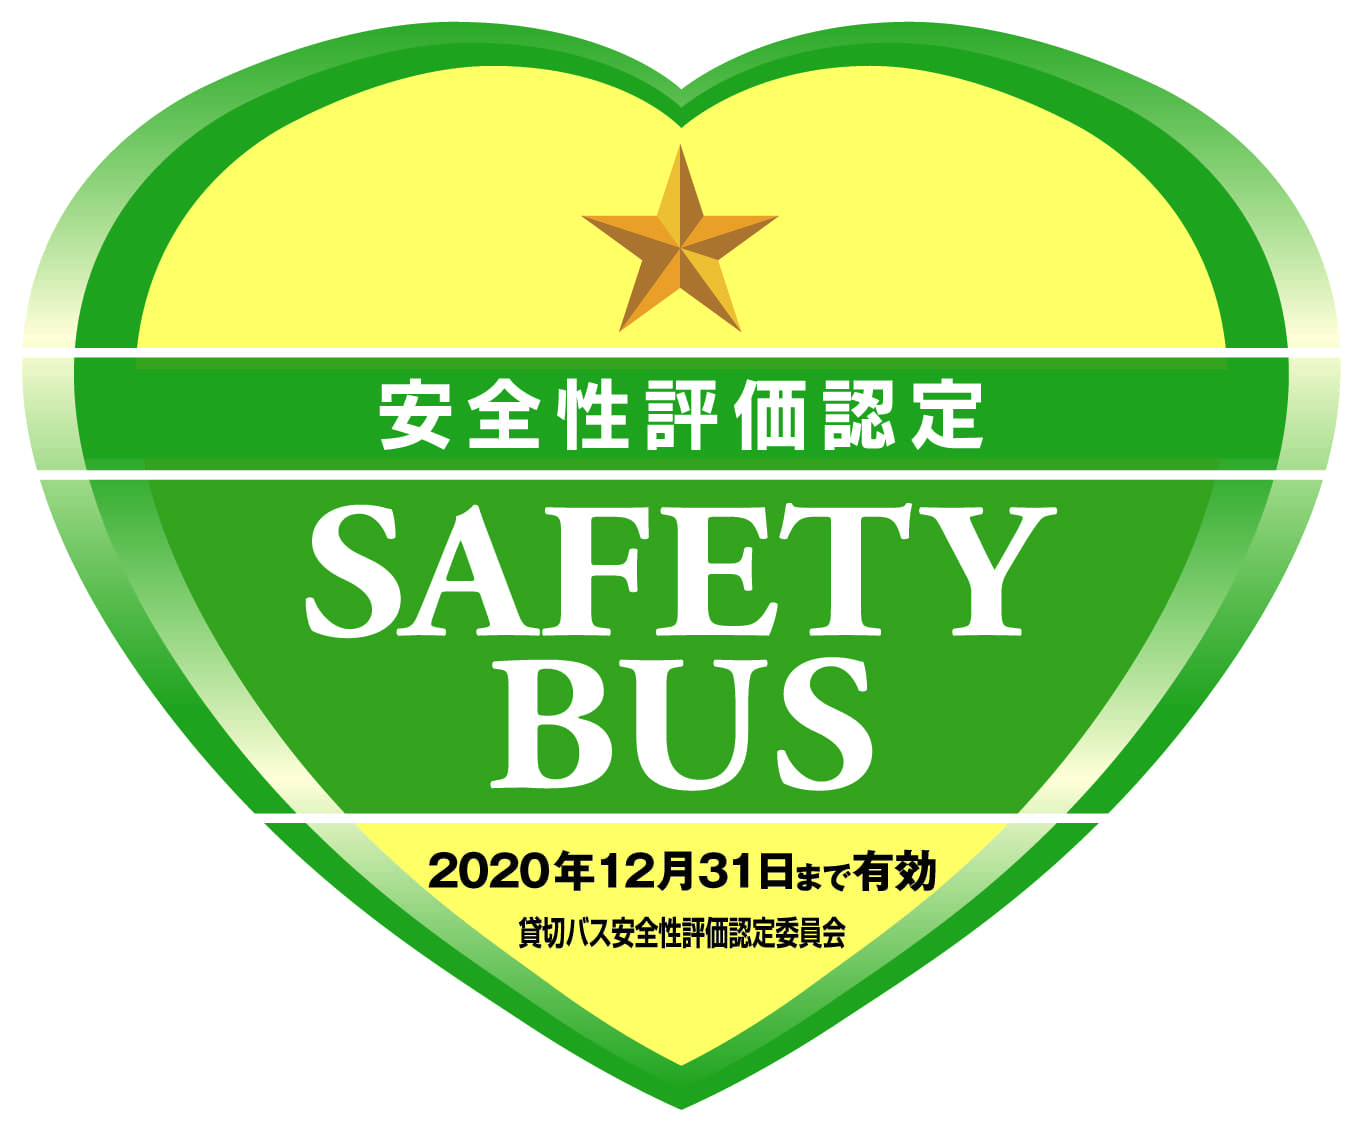 http://chukyo-koutsu.com/files/libs/192/201809190912507146.jpg